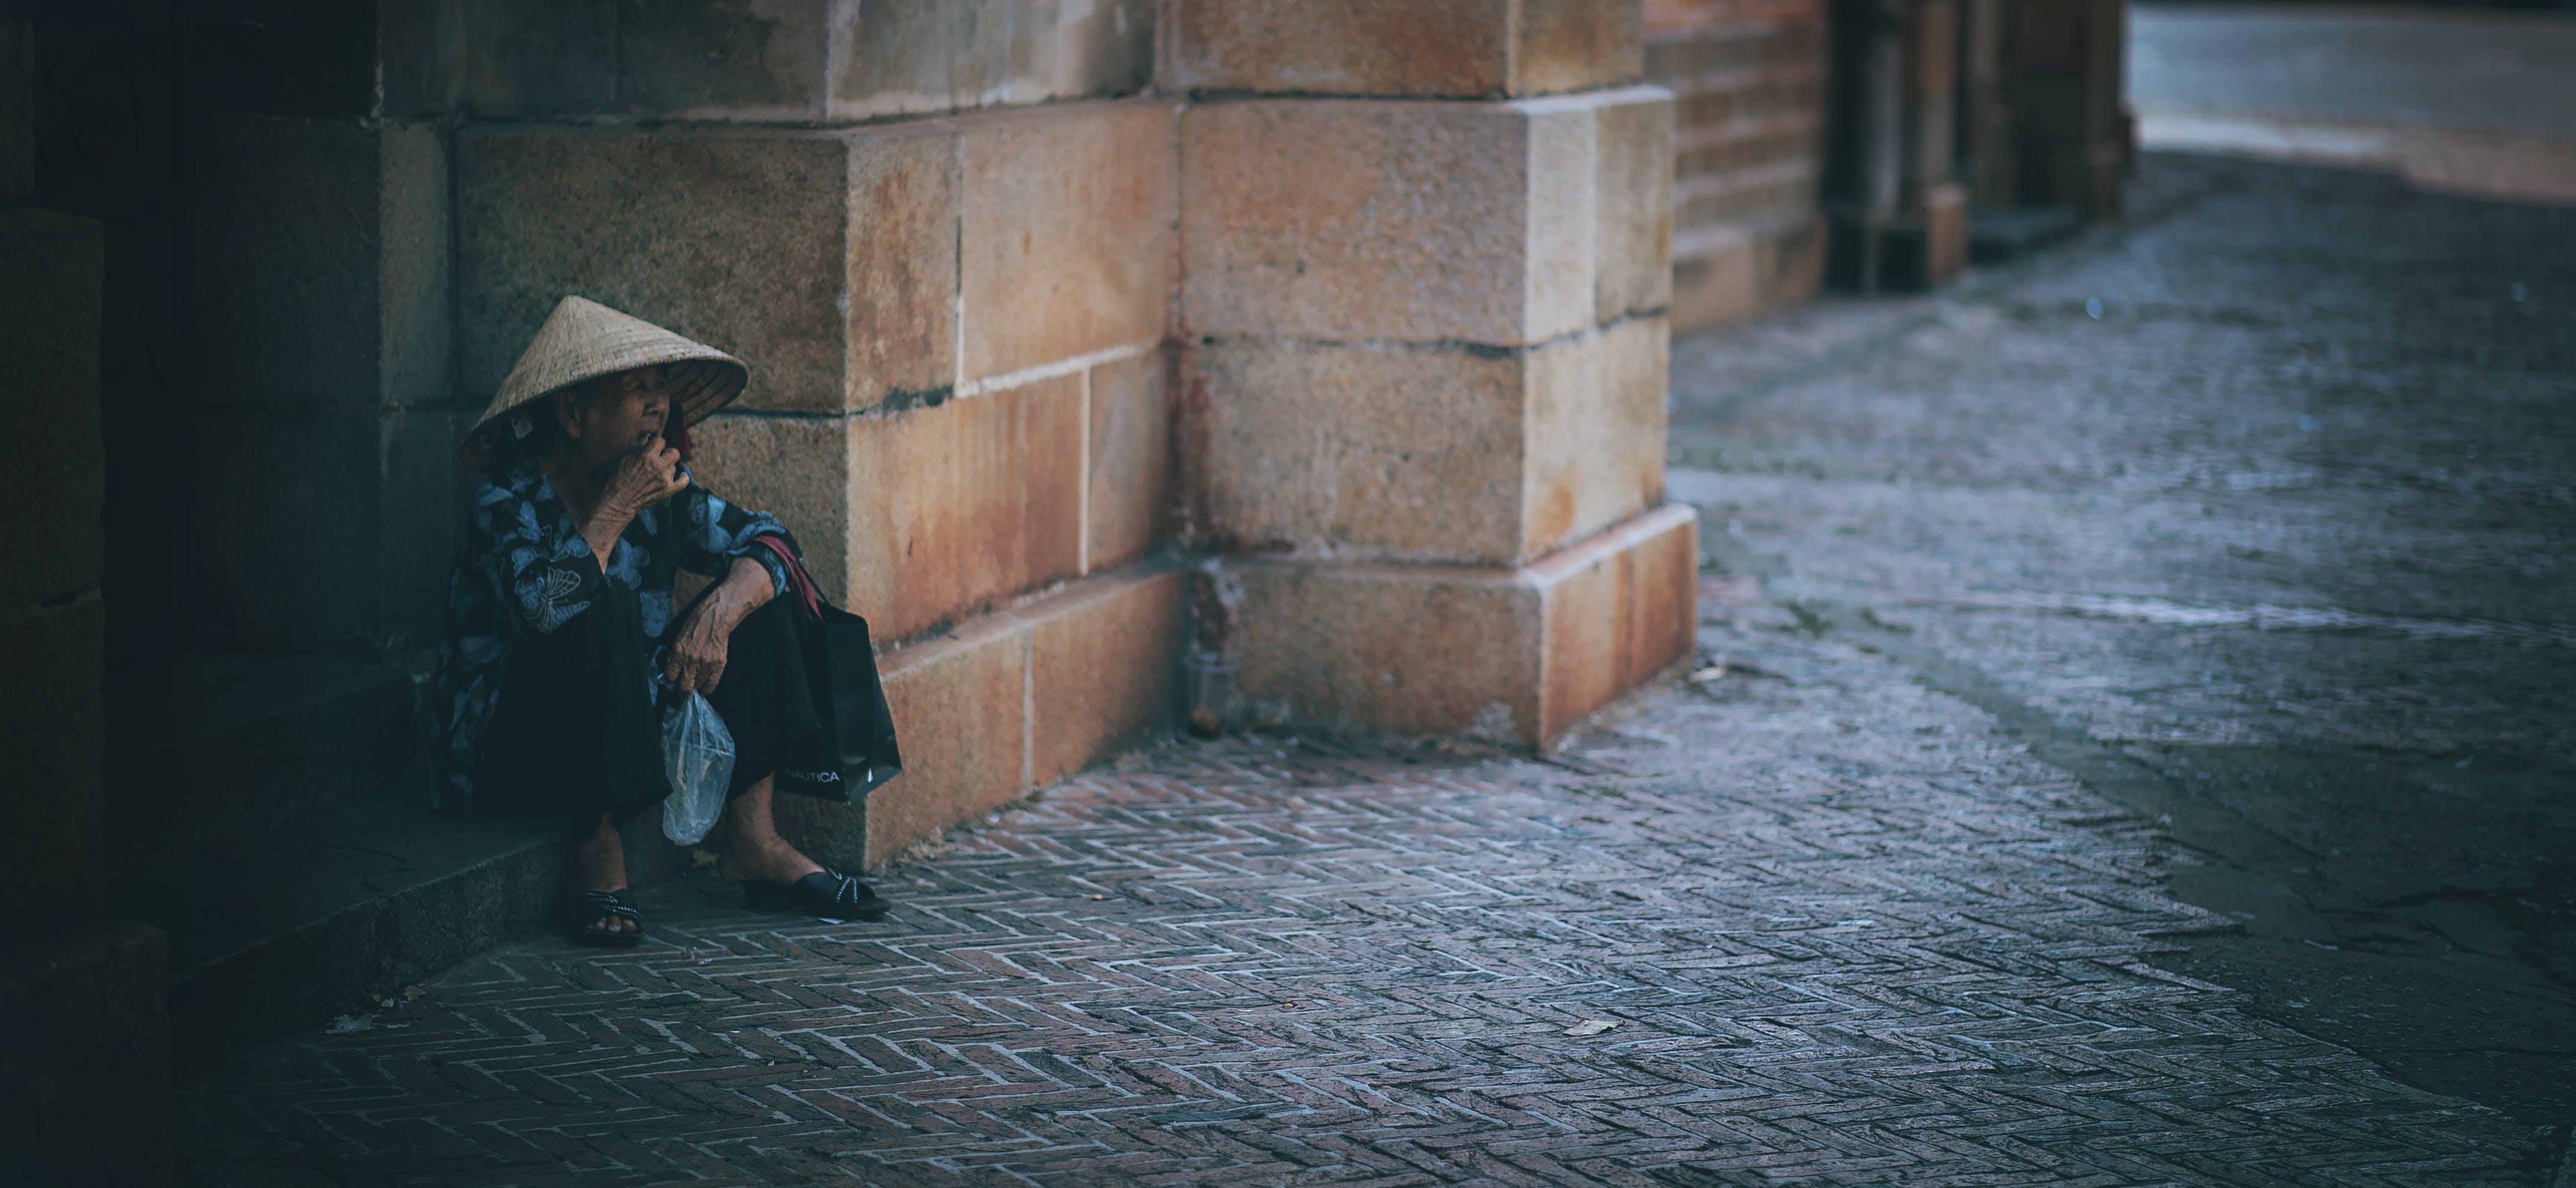 Fotos de stock gratuitas de adulto, arquitectura, calle, carretera